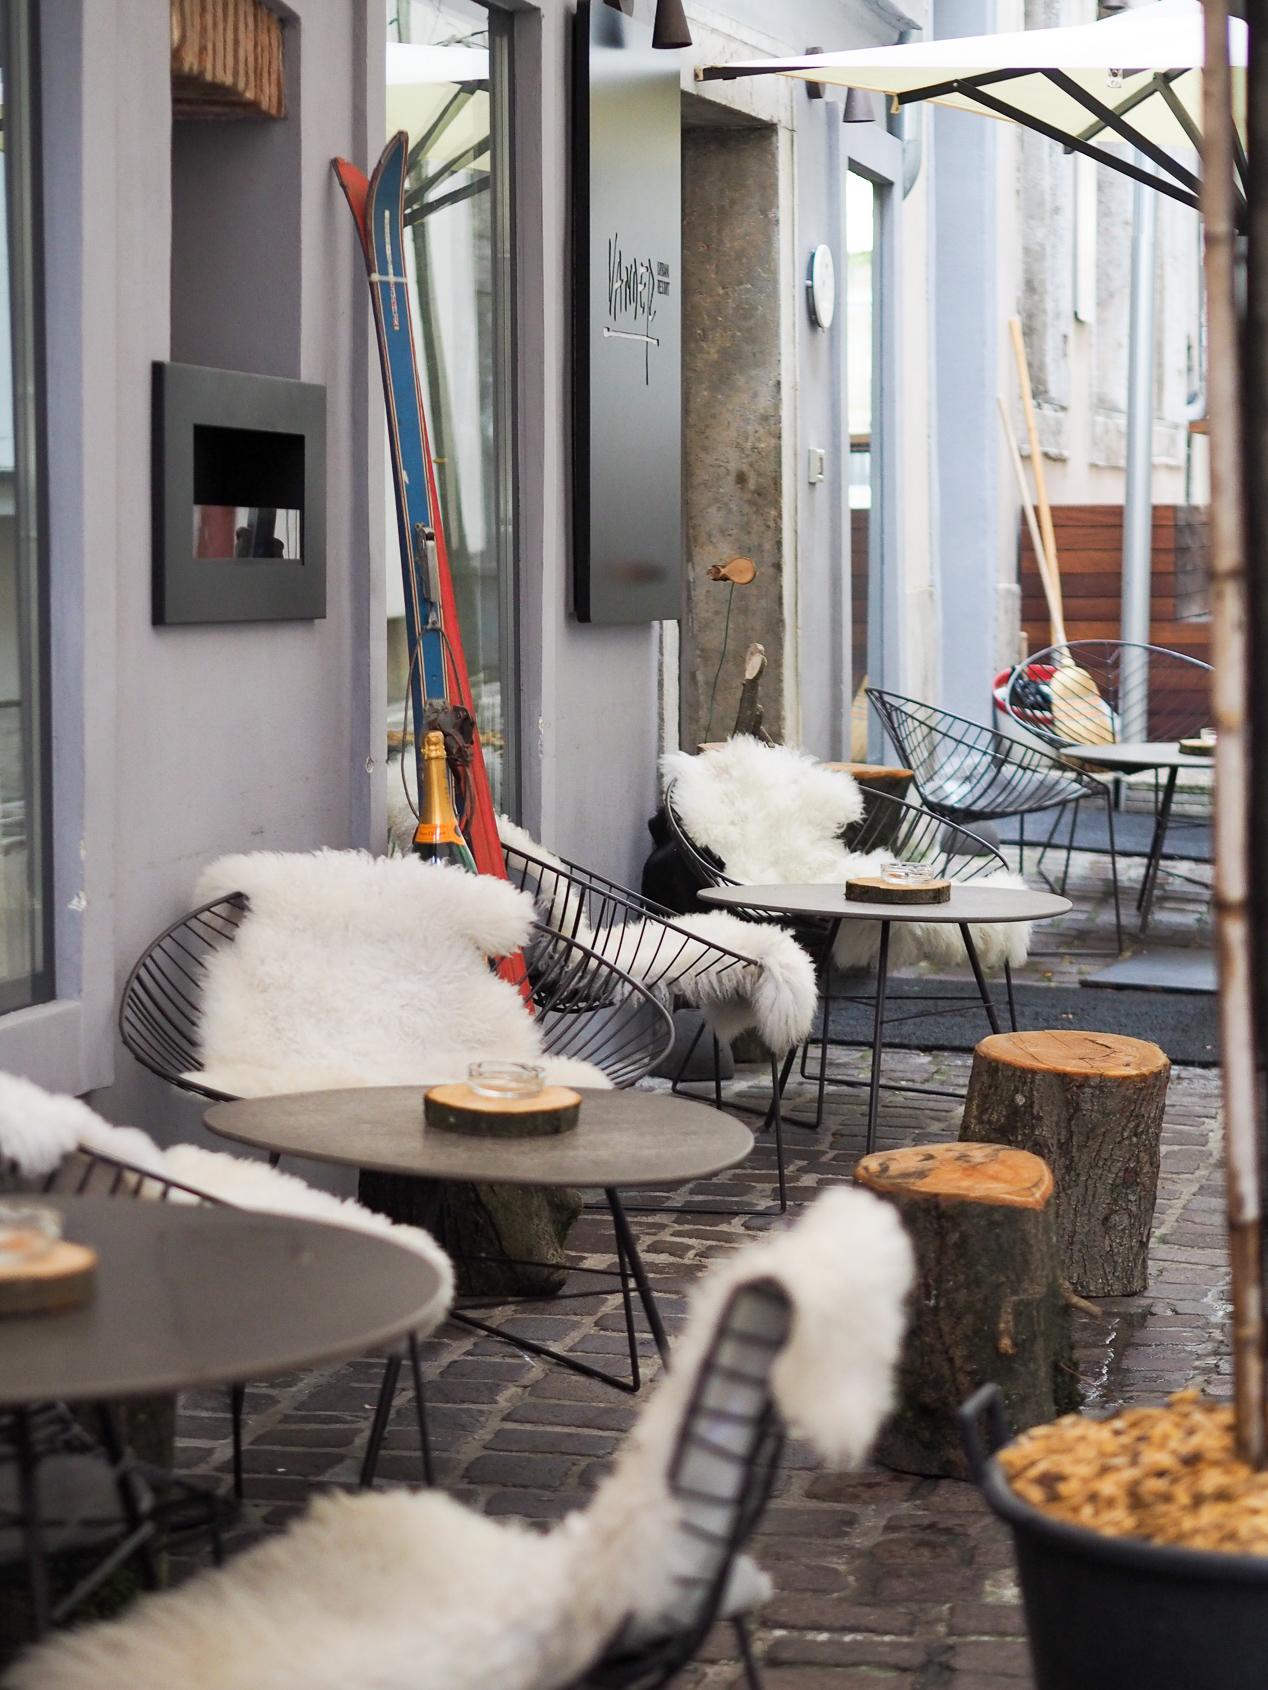 Ljubljana, travelwithme, Travelblogger, Städtetrip, Kurztrip, Hotel, Lakatyfox, Lifestyle-8